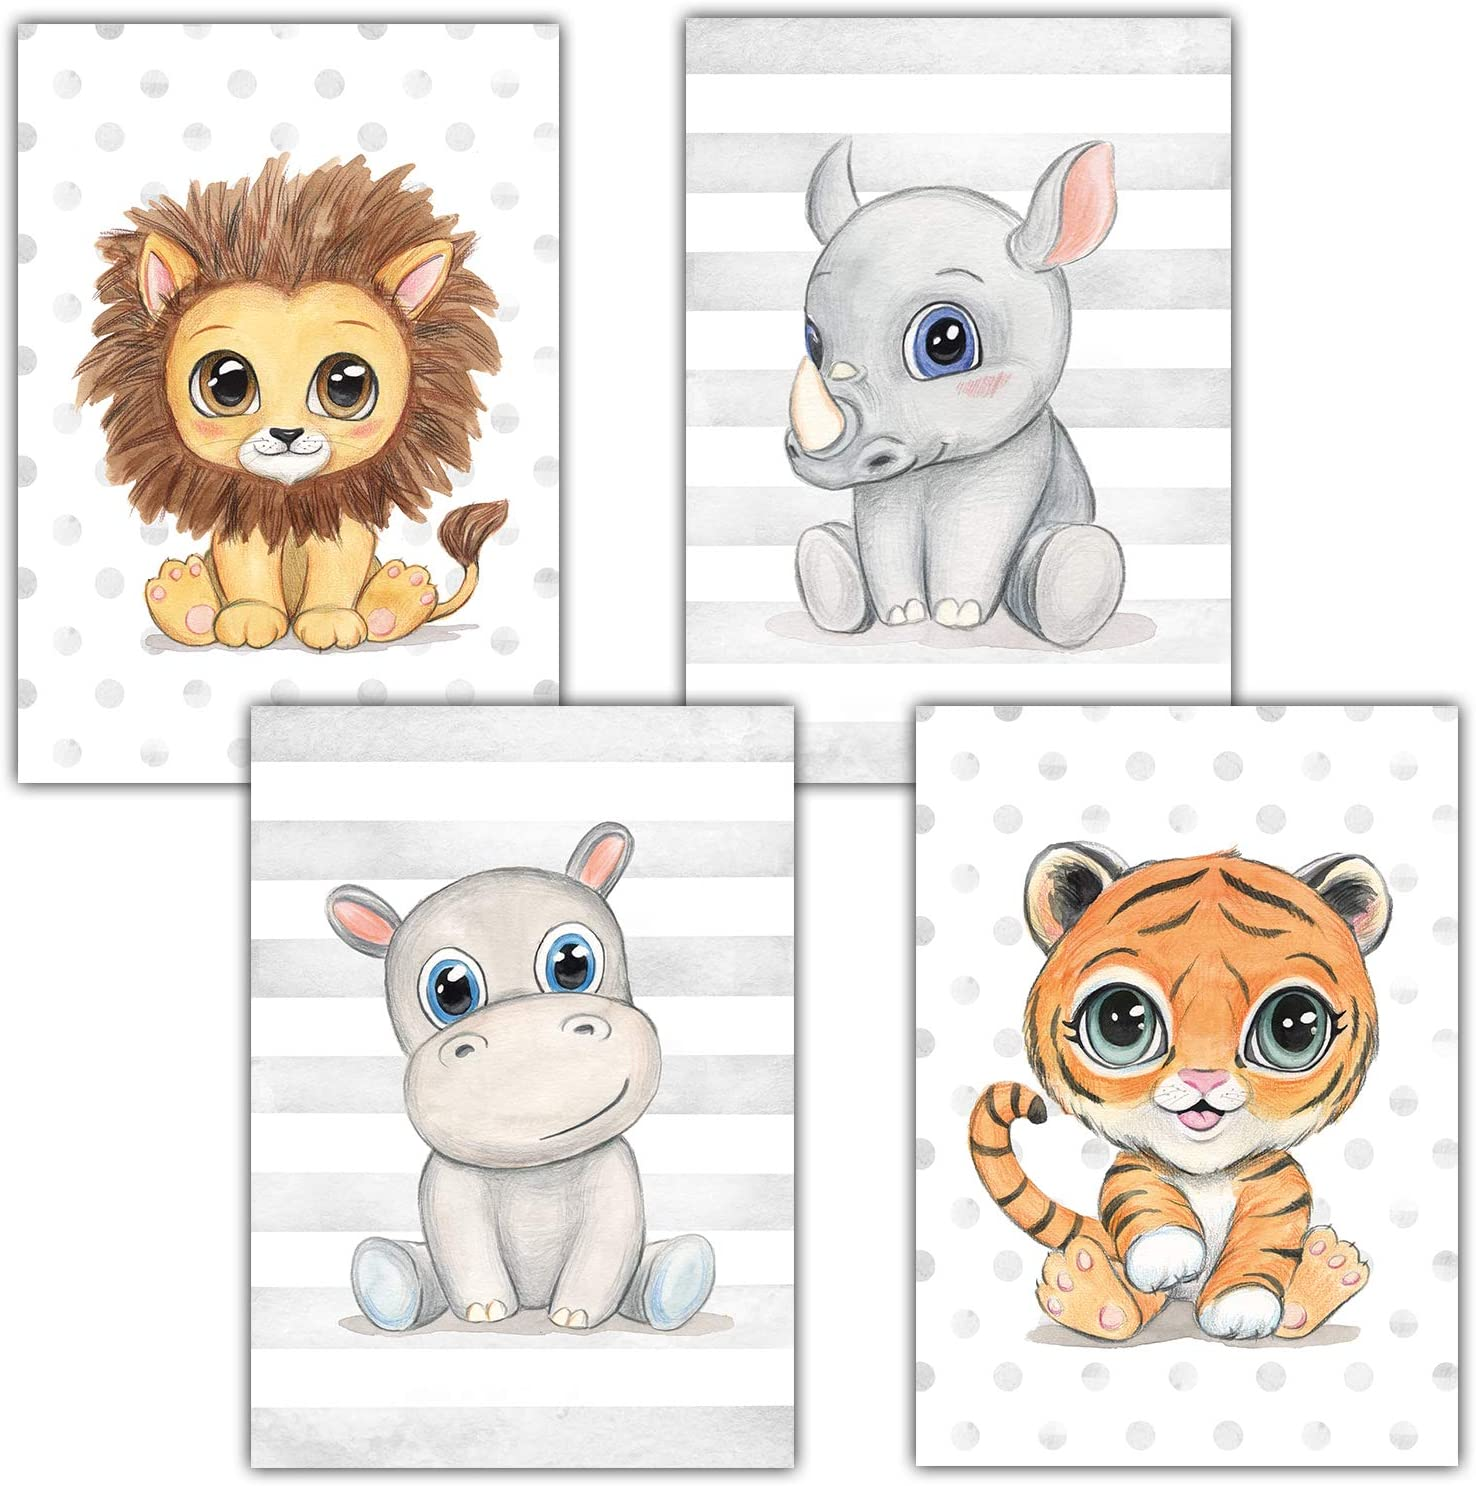 Frechdax® - Juego de 4 pósteres decorativos para habitación infantil, tamaño DIN A4, diseño de animales del bosque, África, Juego de 4 león, cuerno nasal, hipopótamo, tigre., DIN A4